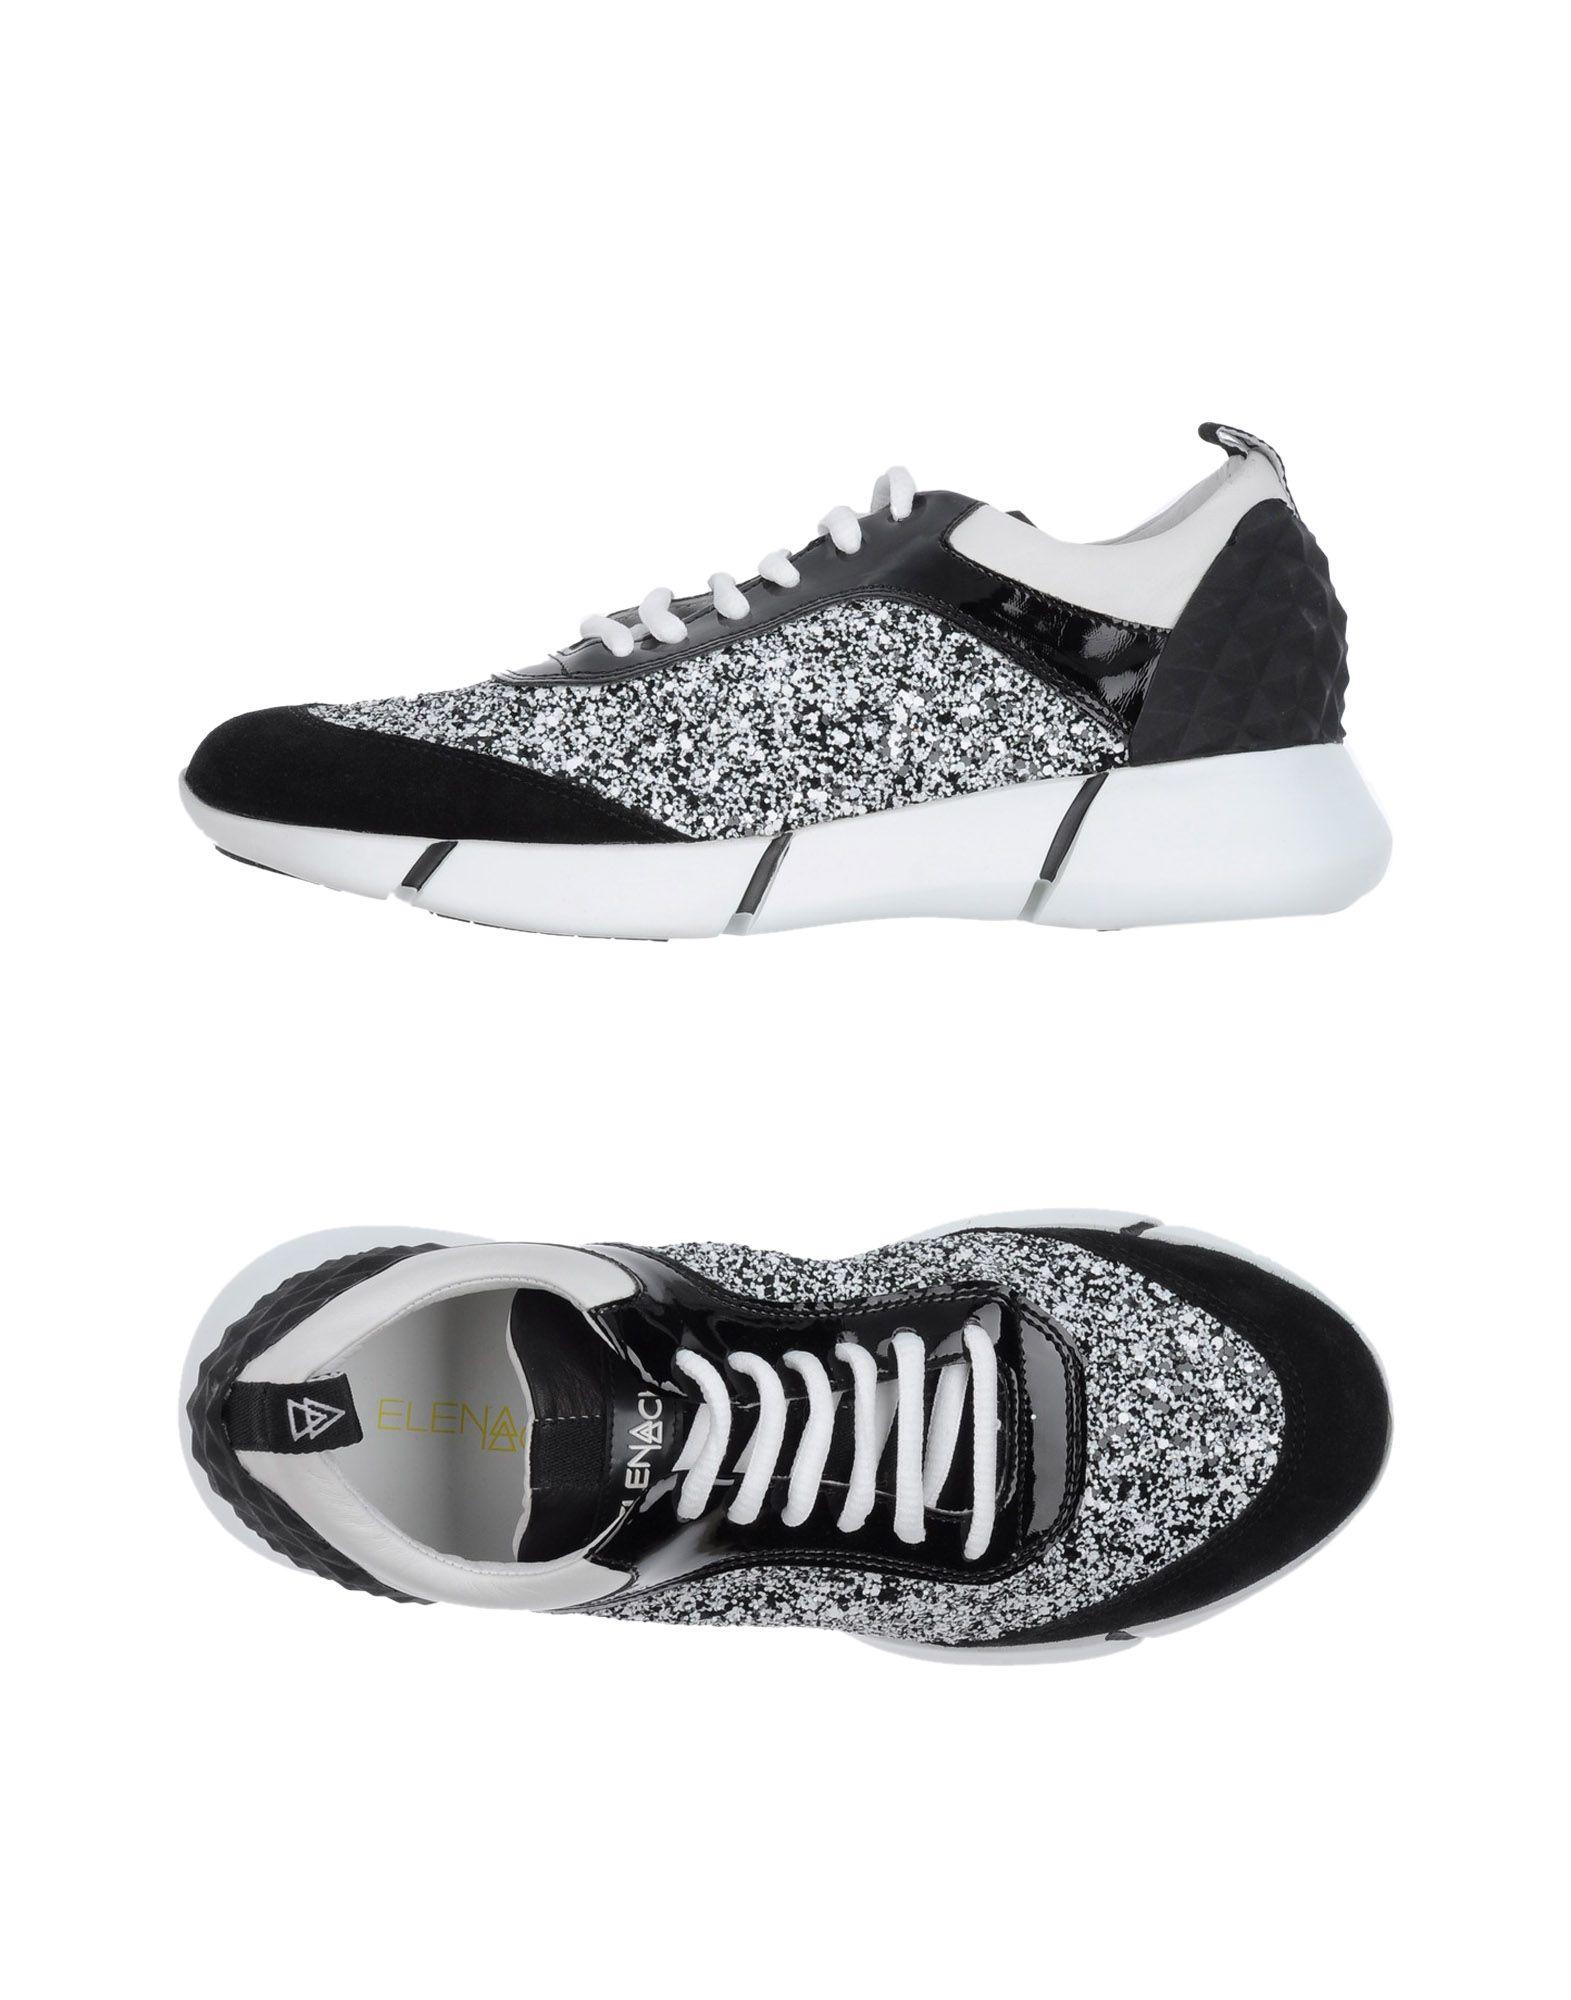 Stilvolle billige Schuhe Damen Elena Iachi Sneakers Damen Schuhe  11252370OQ fbb49f